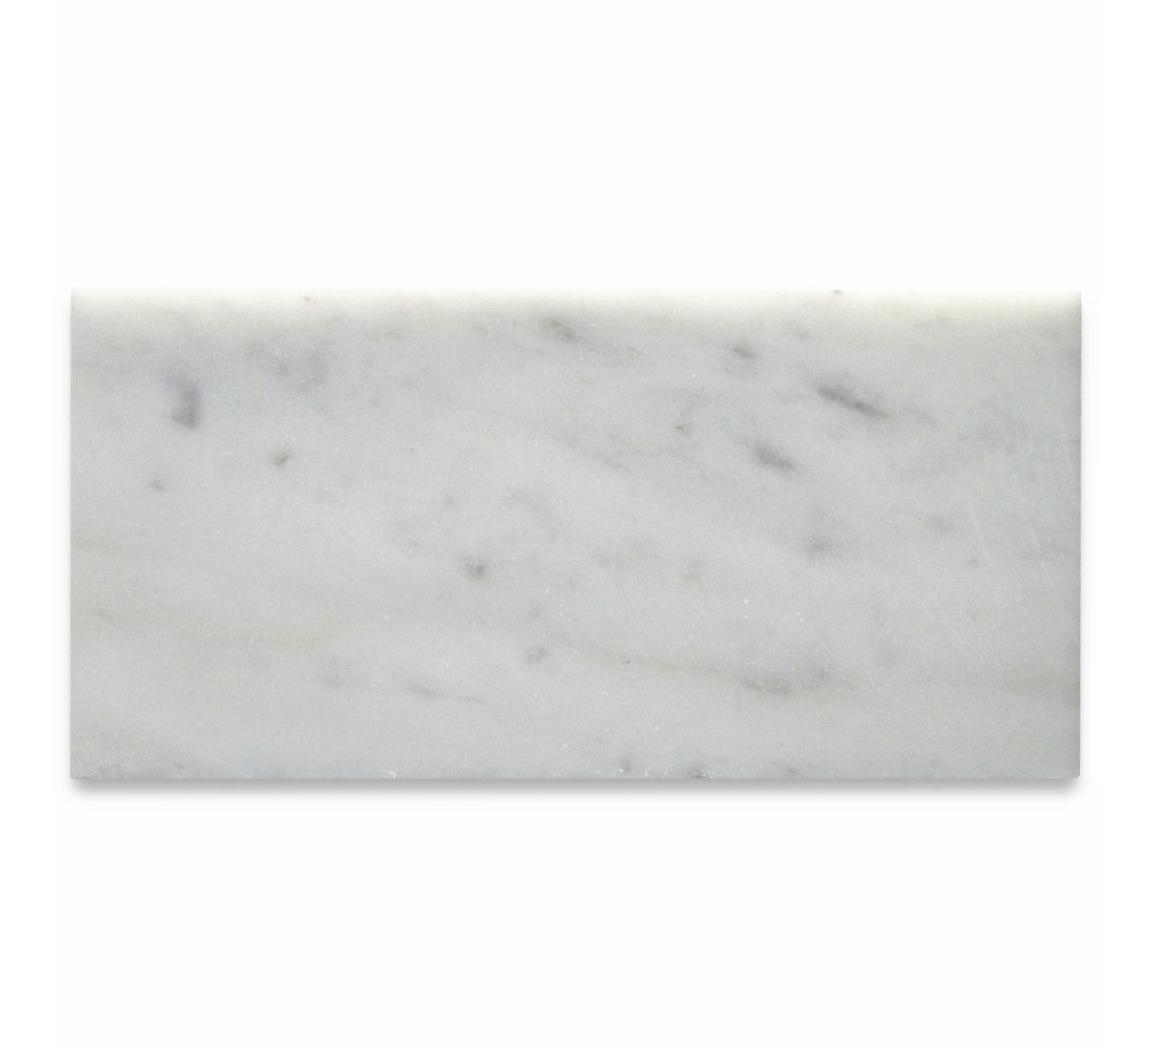 "West Hampton Carrara White Marble Matte Honed Tile 3""x6"""